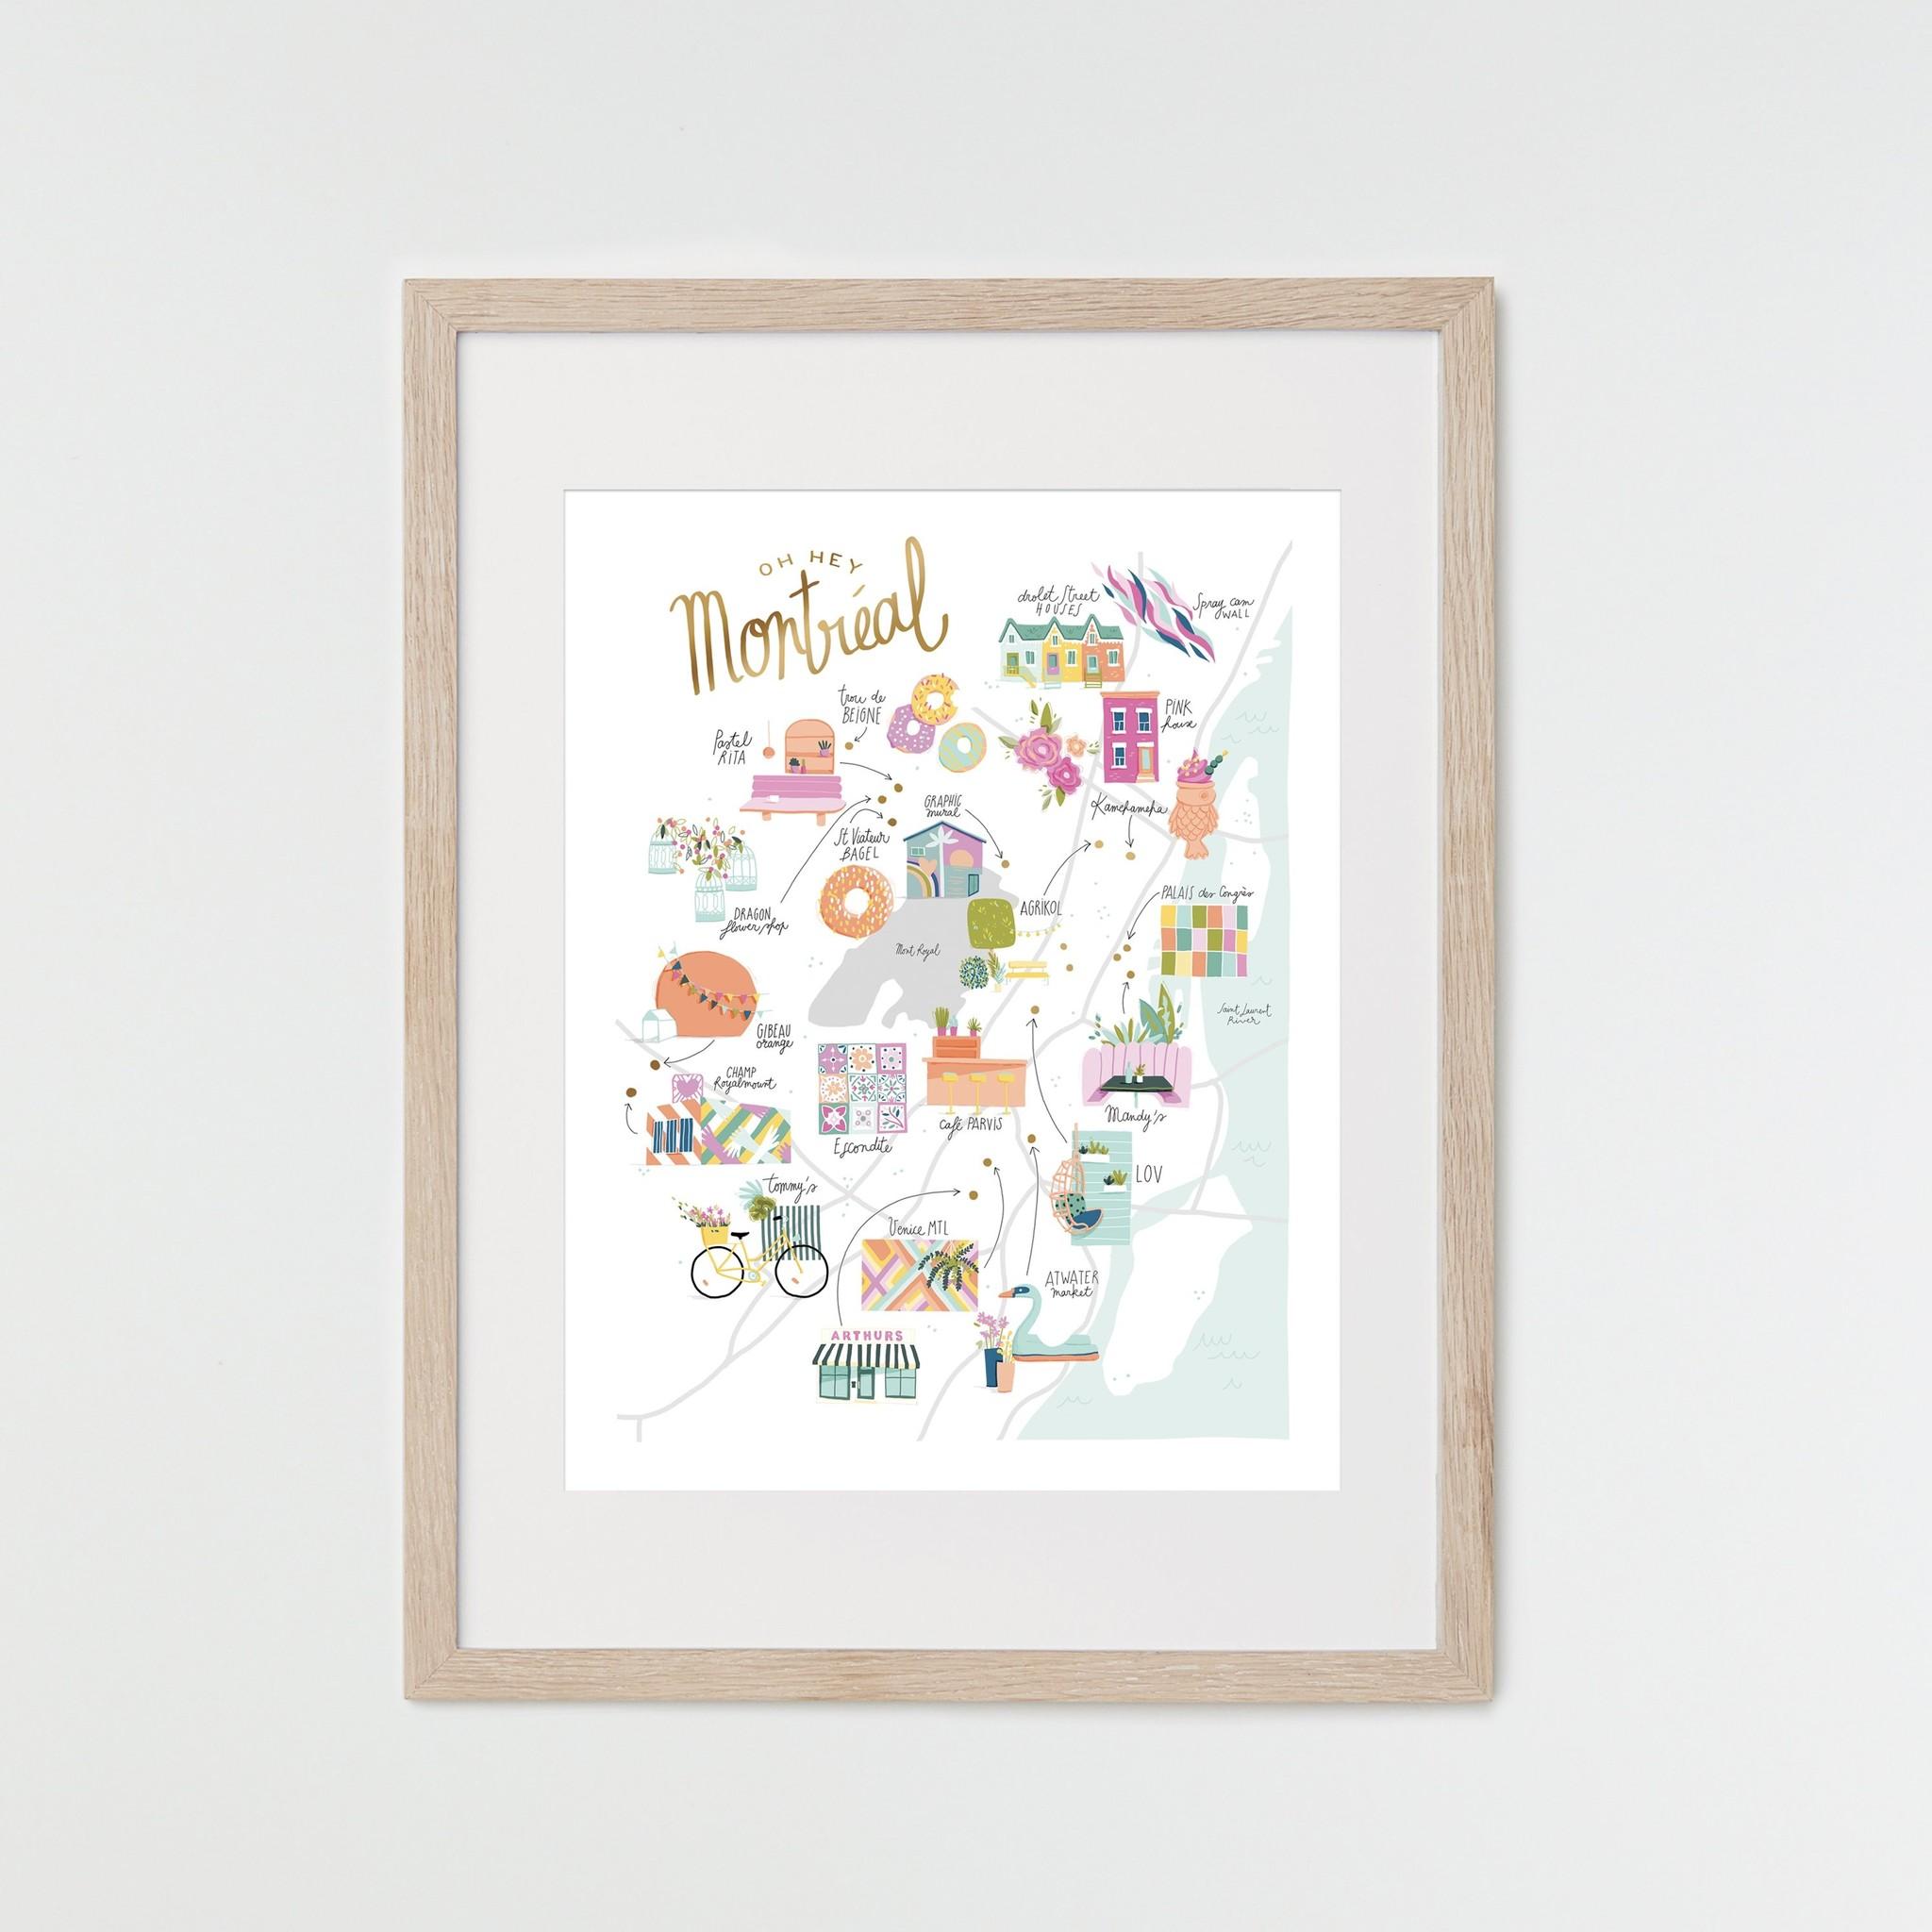 HeyMaca HeyMaca - Print  MTL Hidden Gems (8x10)